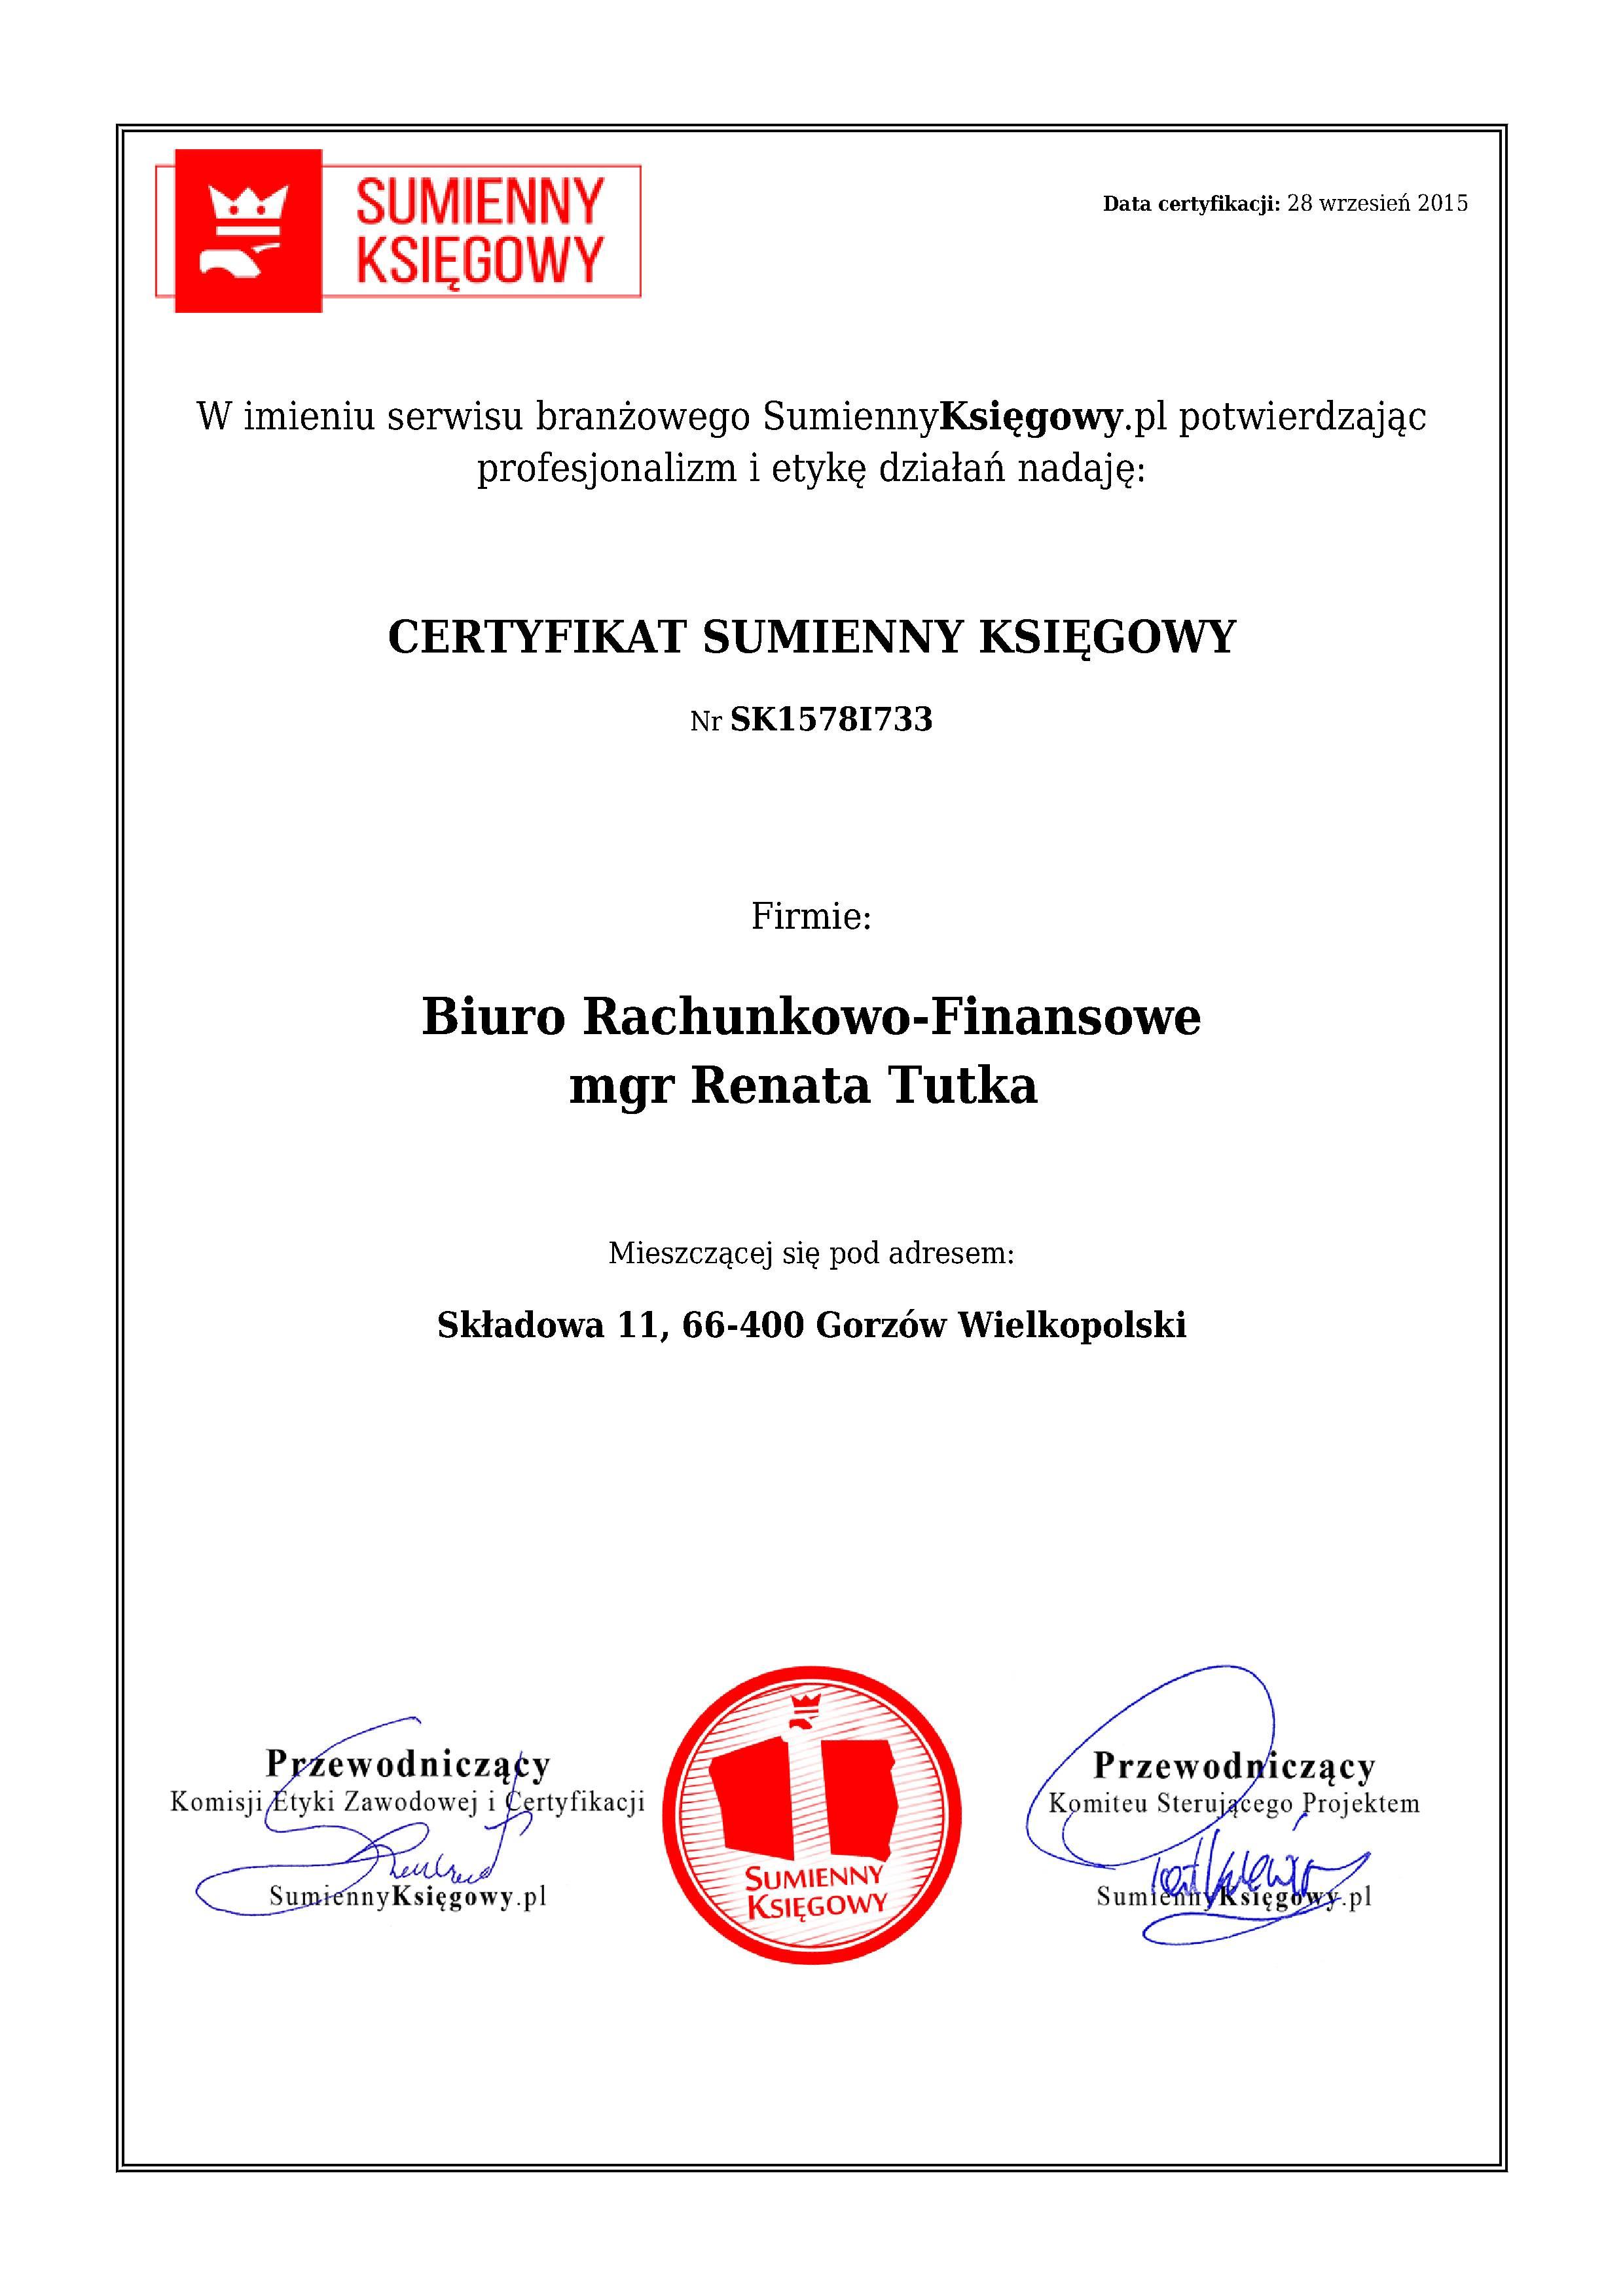 Certyfikat Biuro Rachunkowo-Finansowe mgr Renata Tutka